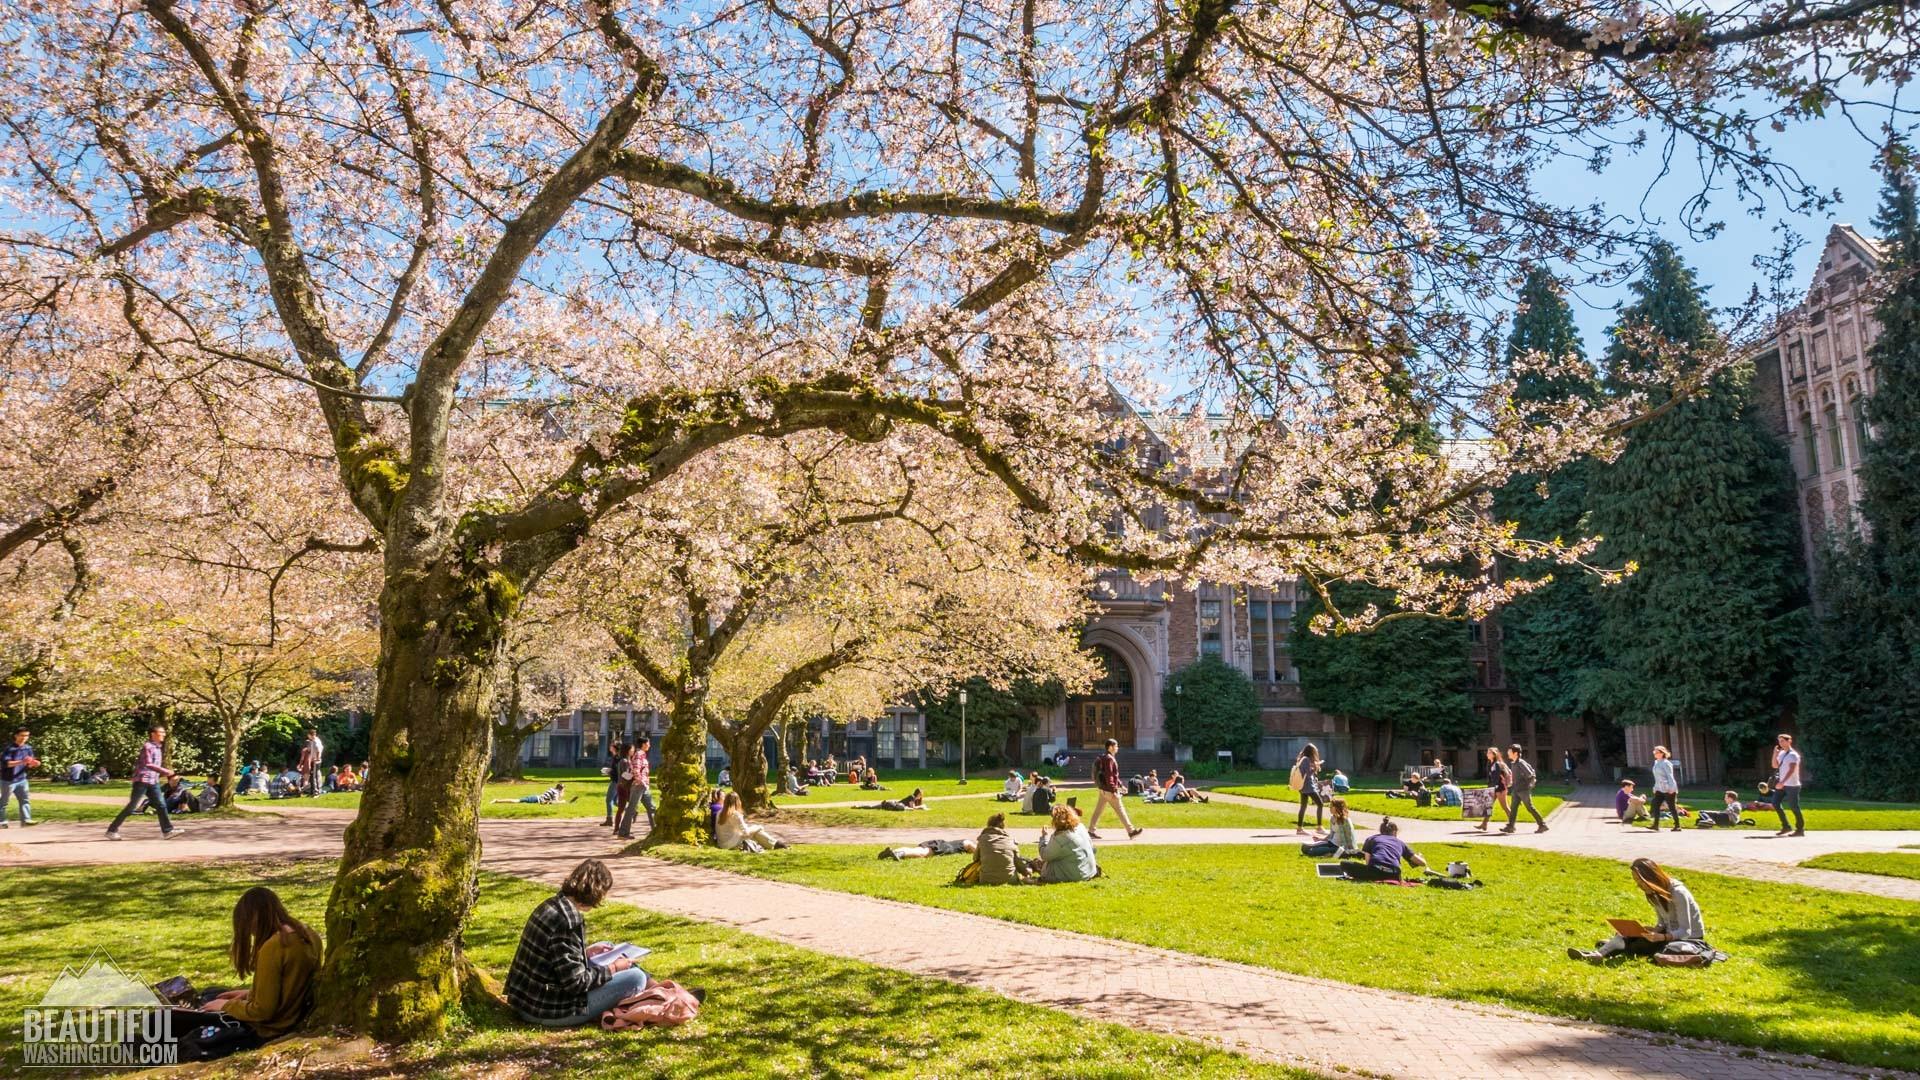 Cherry Blossoms 71 Cherry Blossoms 71 …